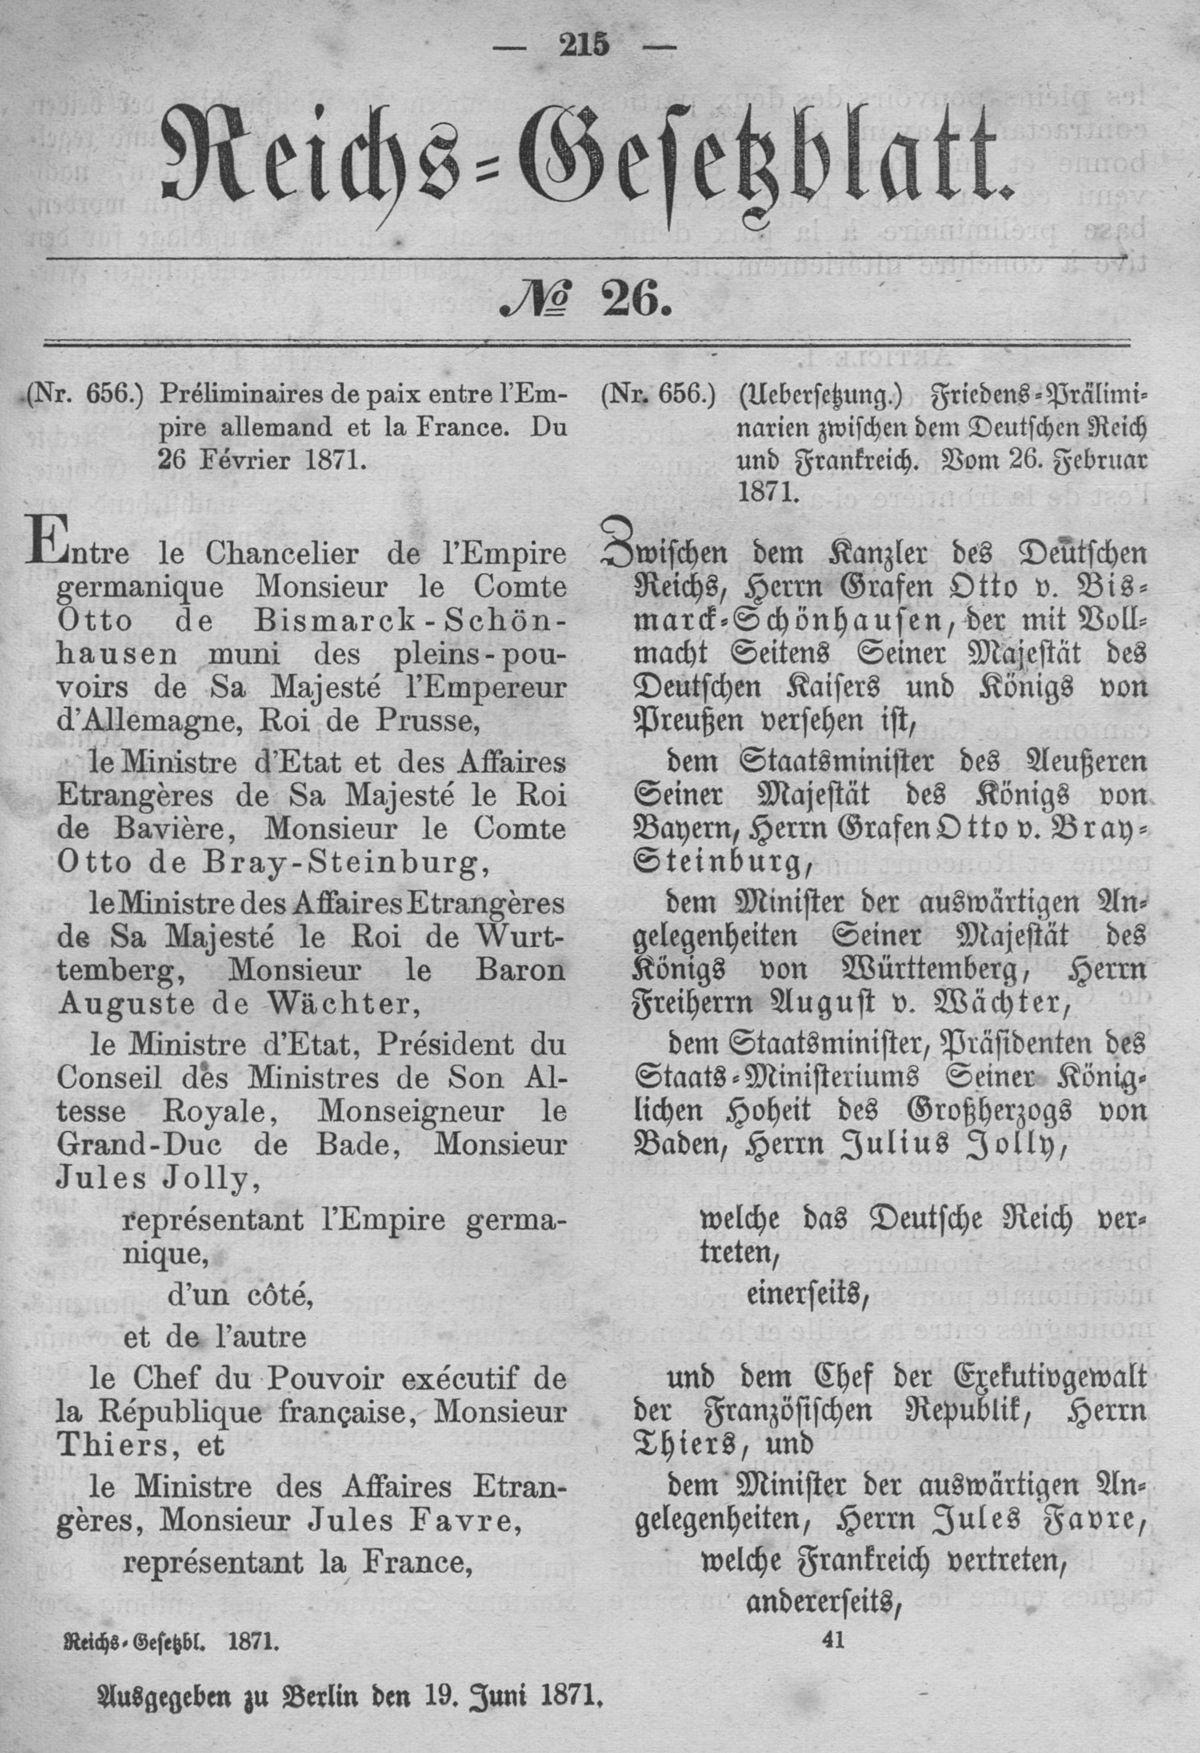 germanys violations of the versailles treaty essay The treaty of versailles was harsh to germany was the treaty of versailles harsh or lenient to writeworkcom/essay/treaty-versailles-harsh-lenient-germany.